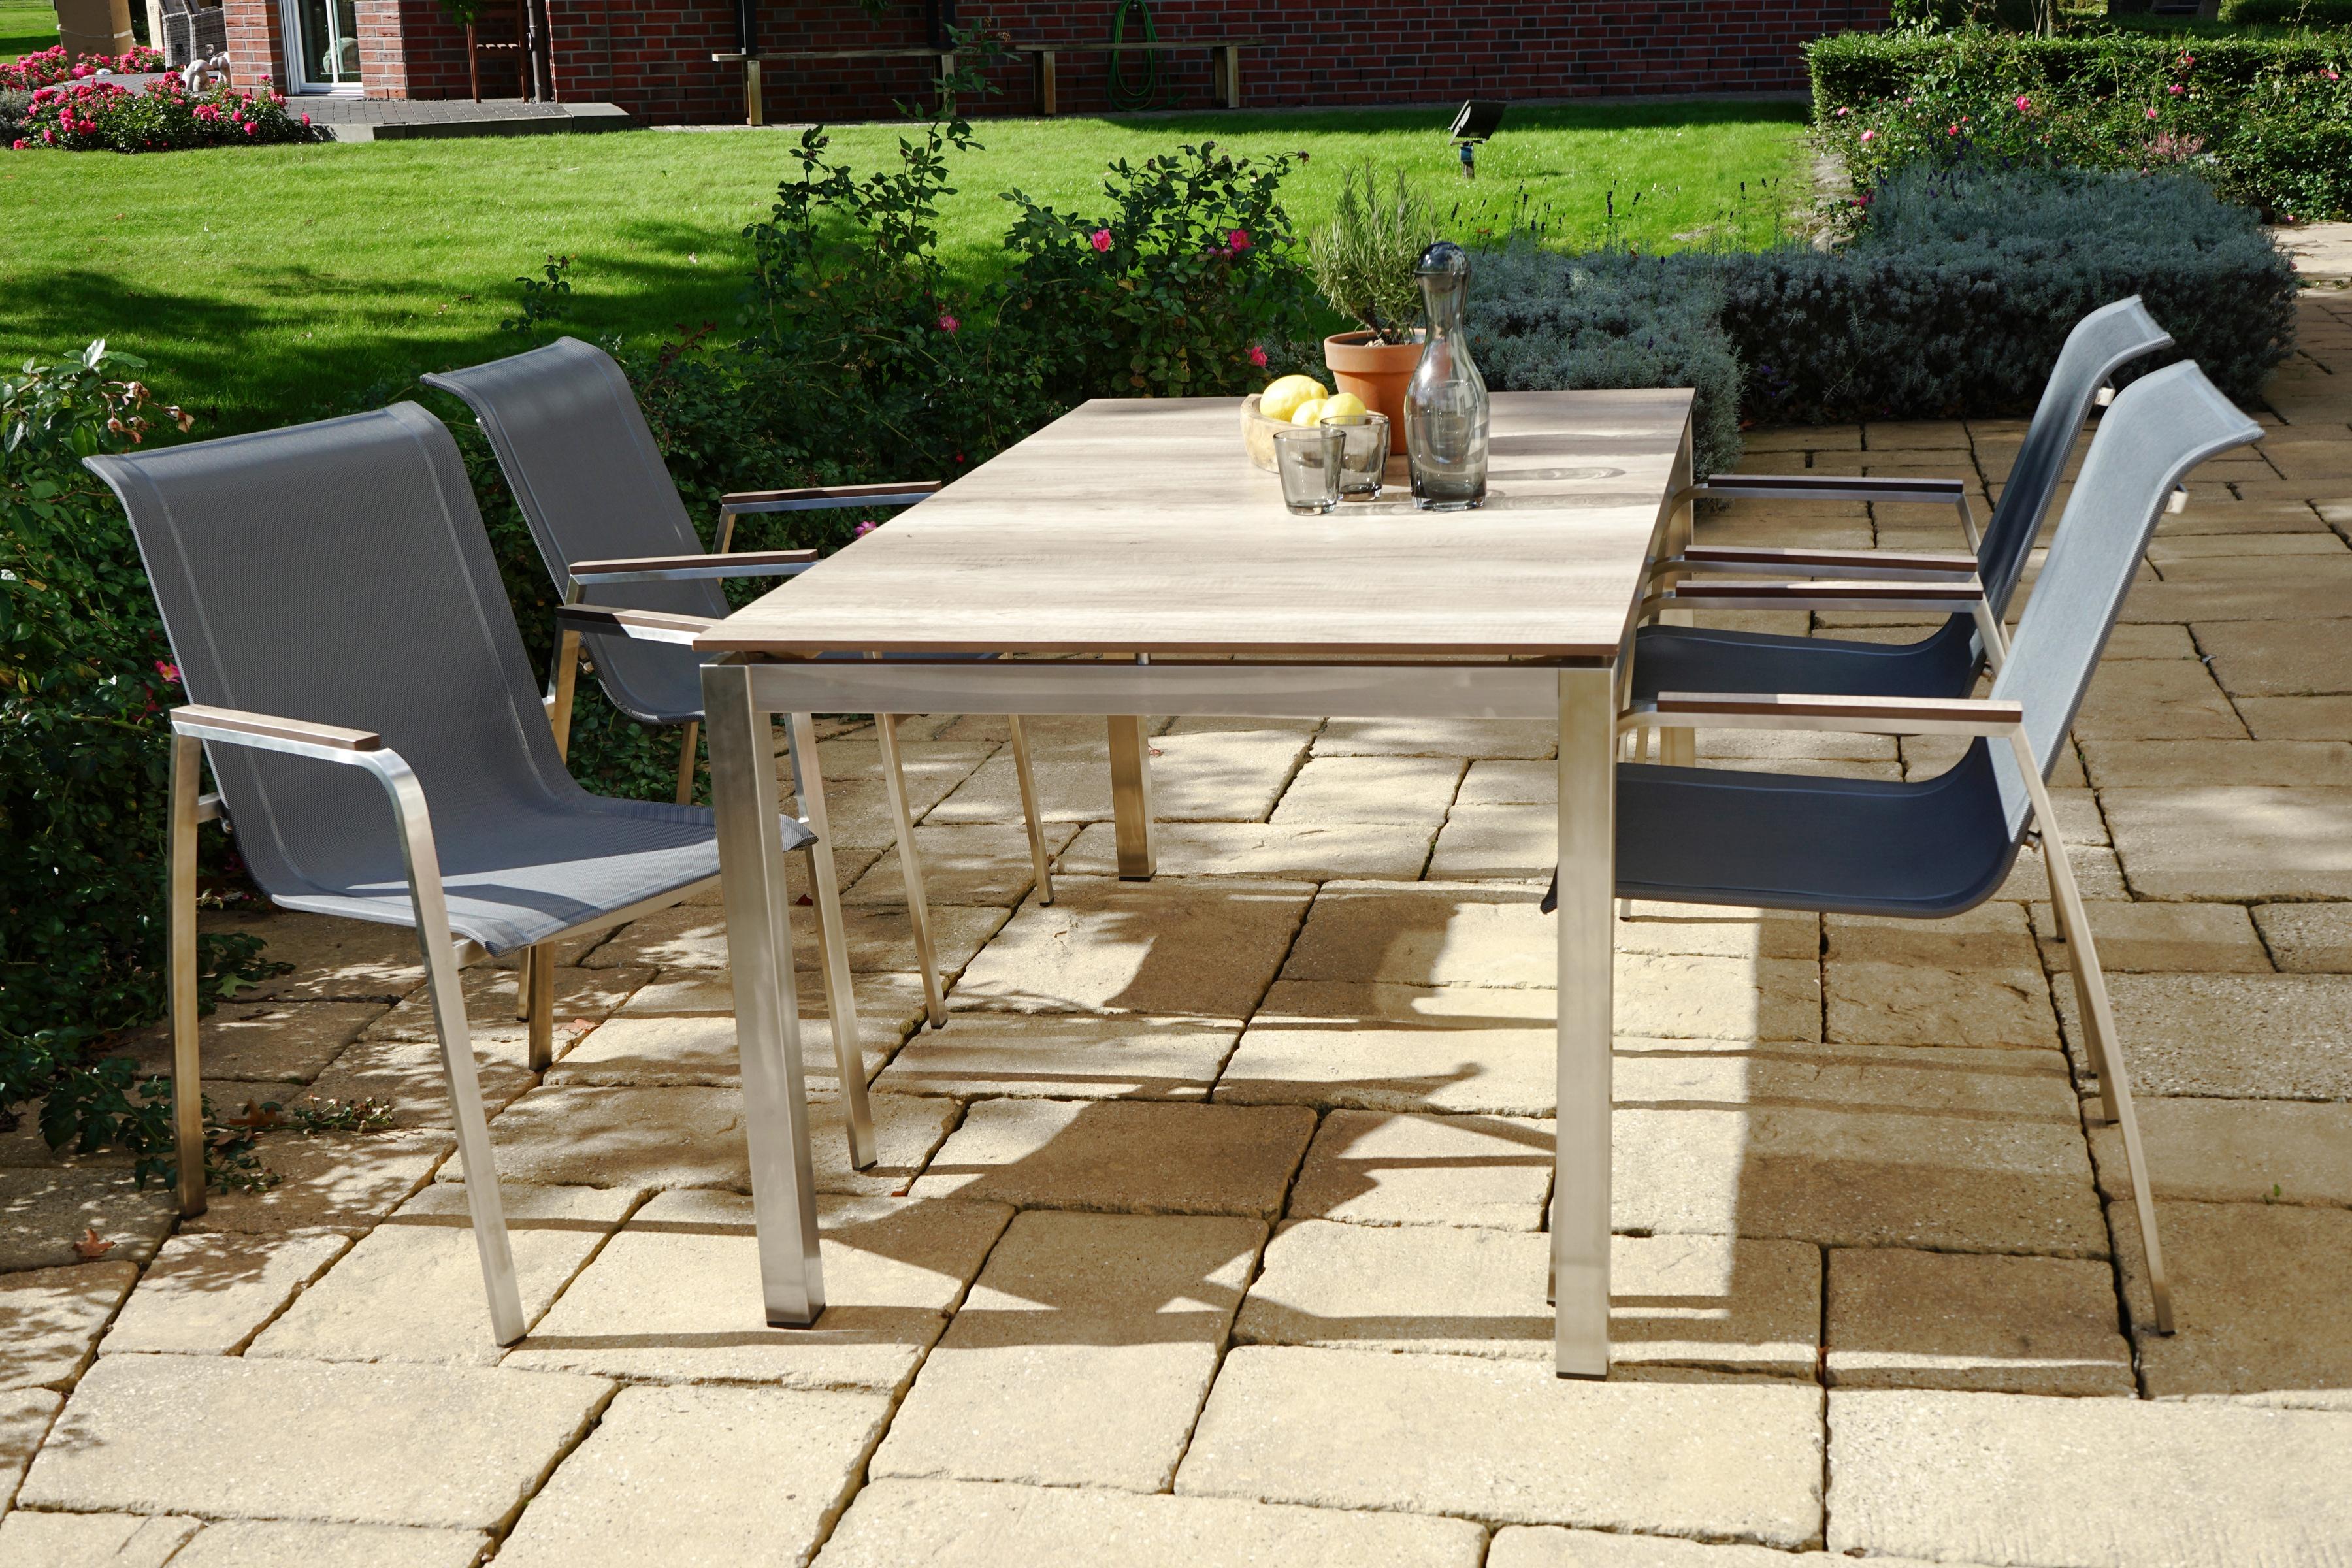 PLOSS Gartenmöbelset Hudson 5-tlg 4 Stühle Tisch 158x90 cm stapelbar Edelstahl